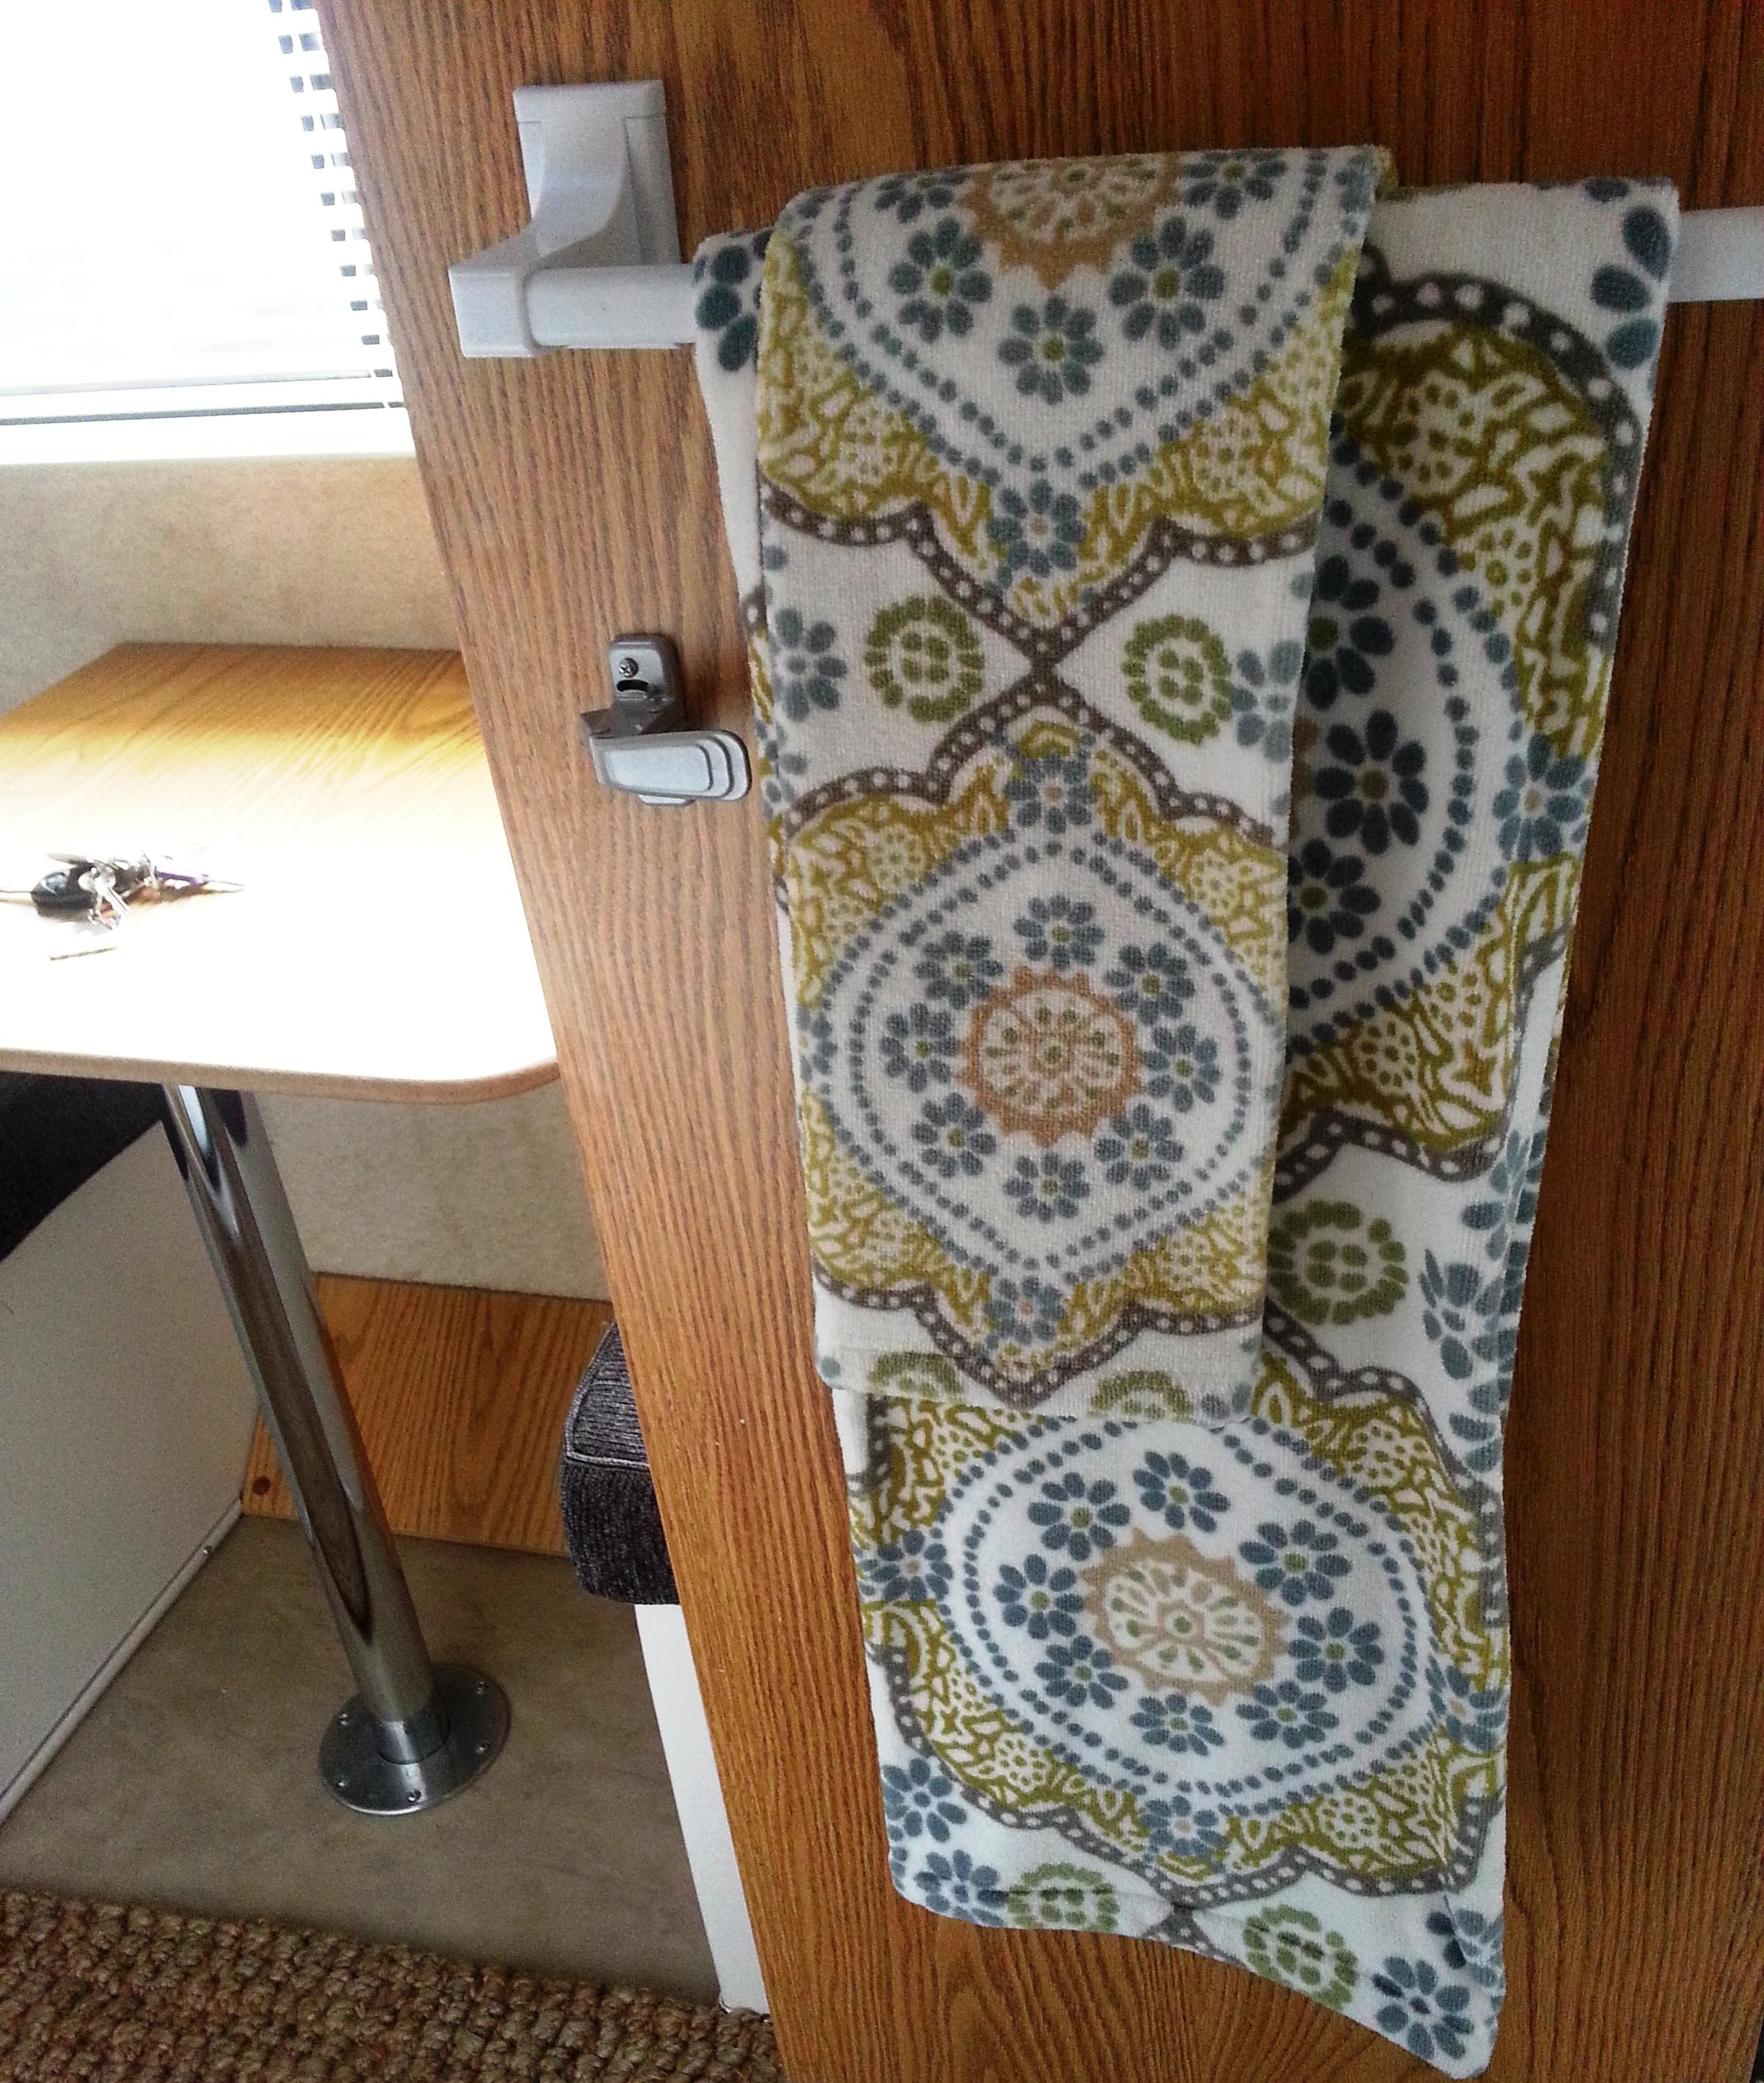 decorative towels and jute rug highway to hoeftland - Decorative Bath Towels